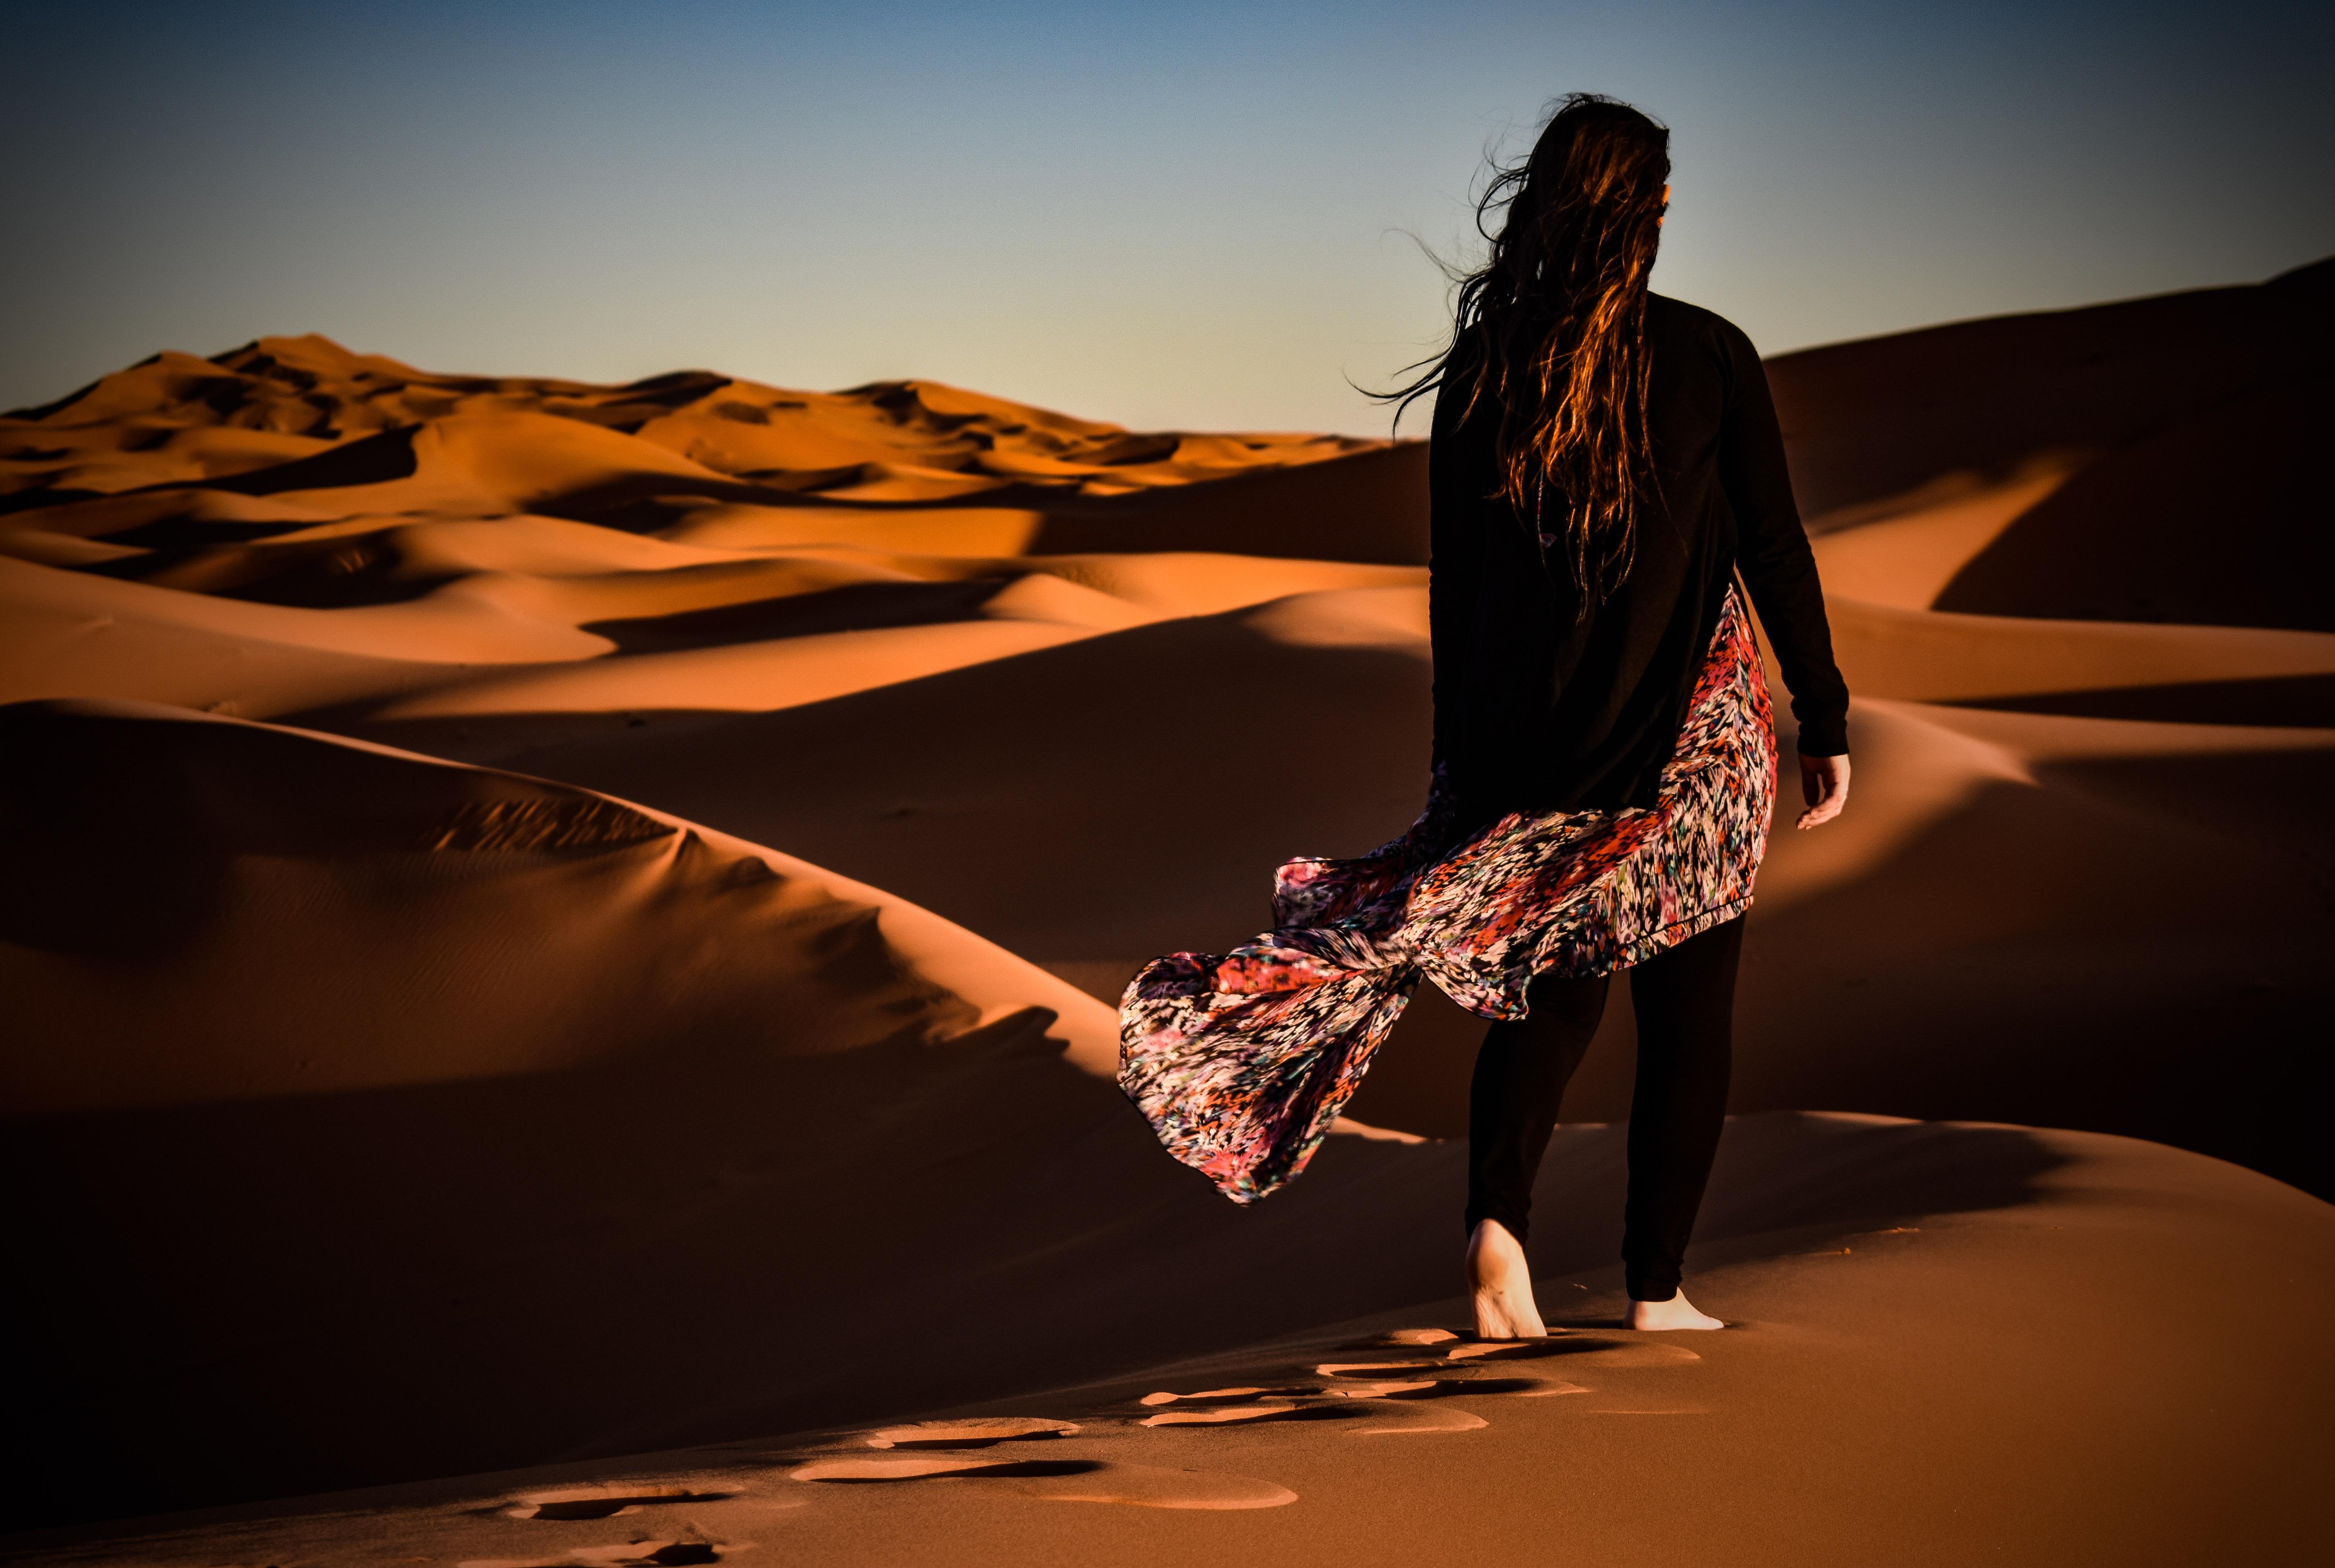 Footprints in Morocco